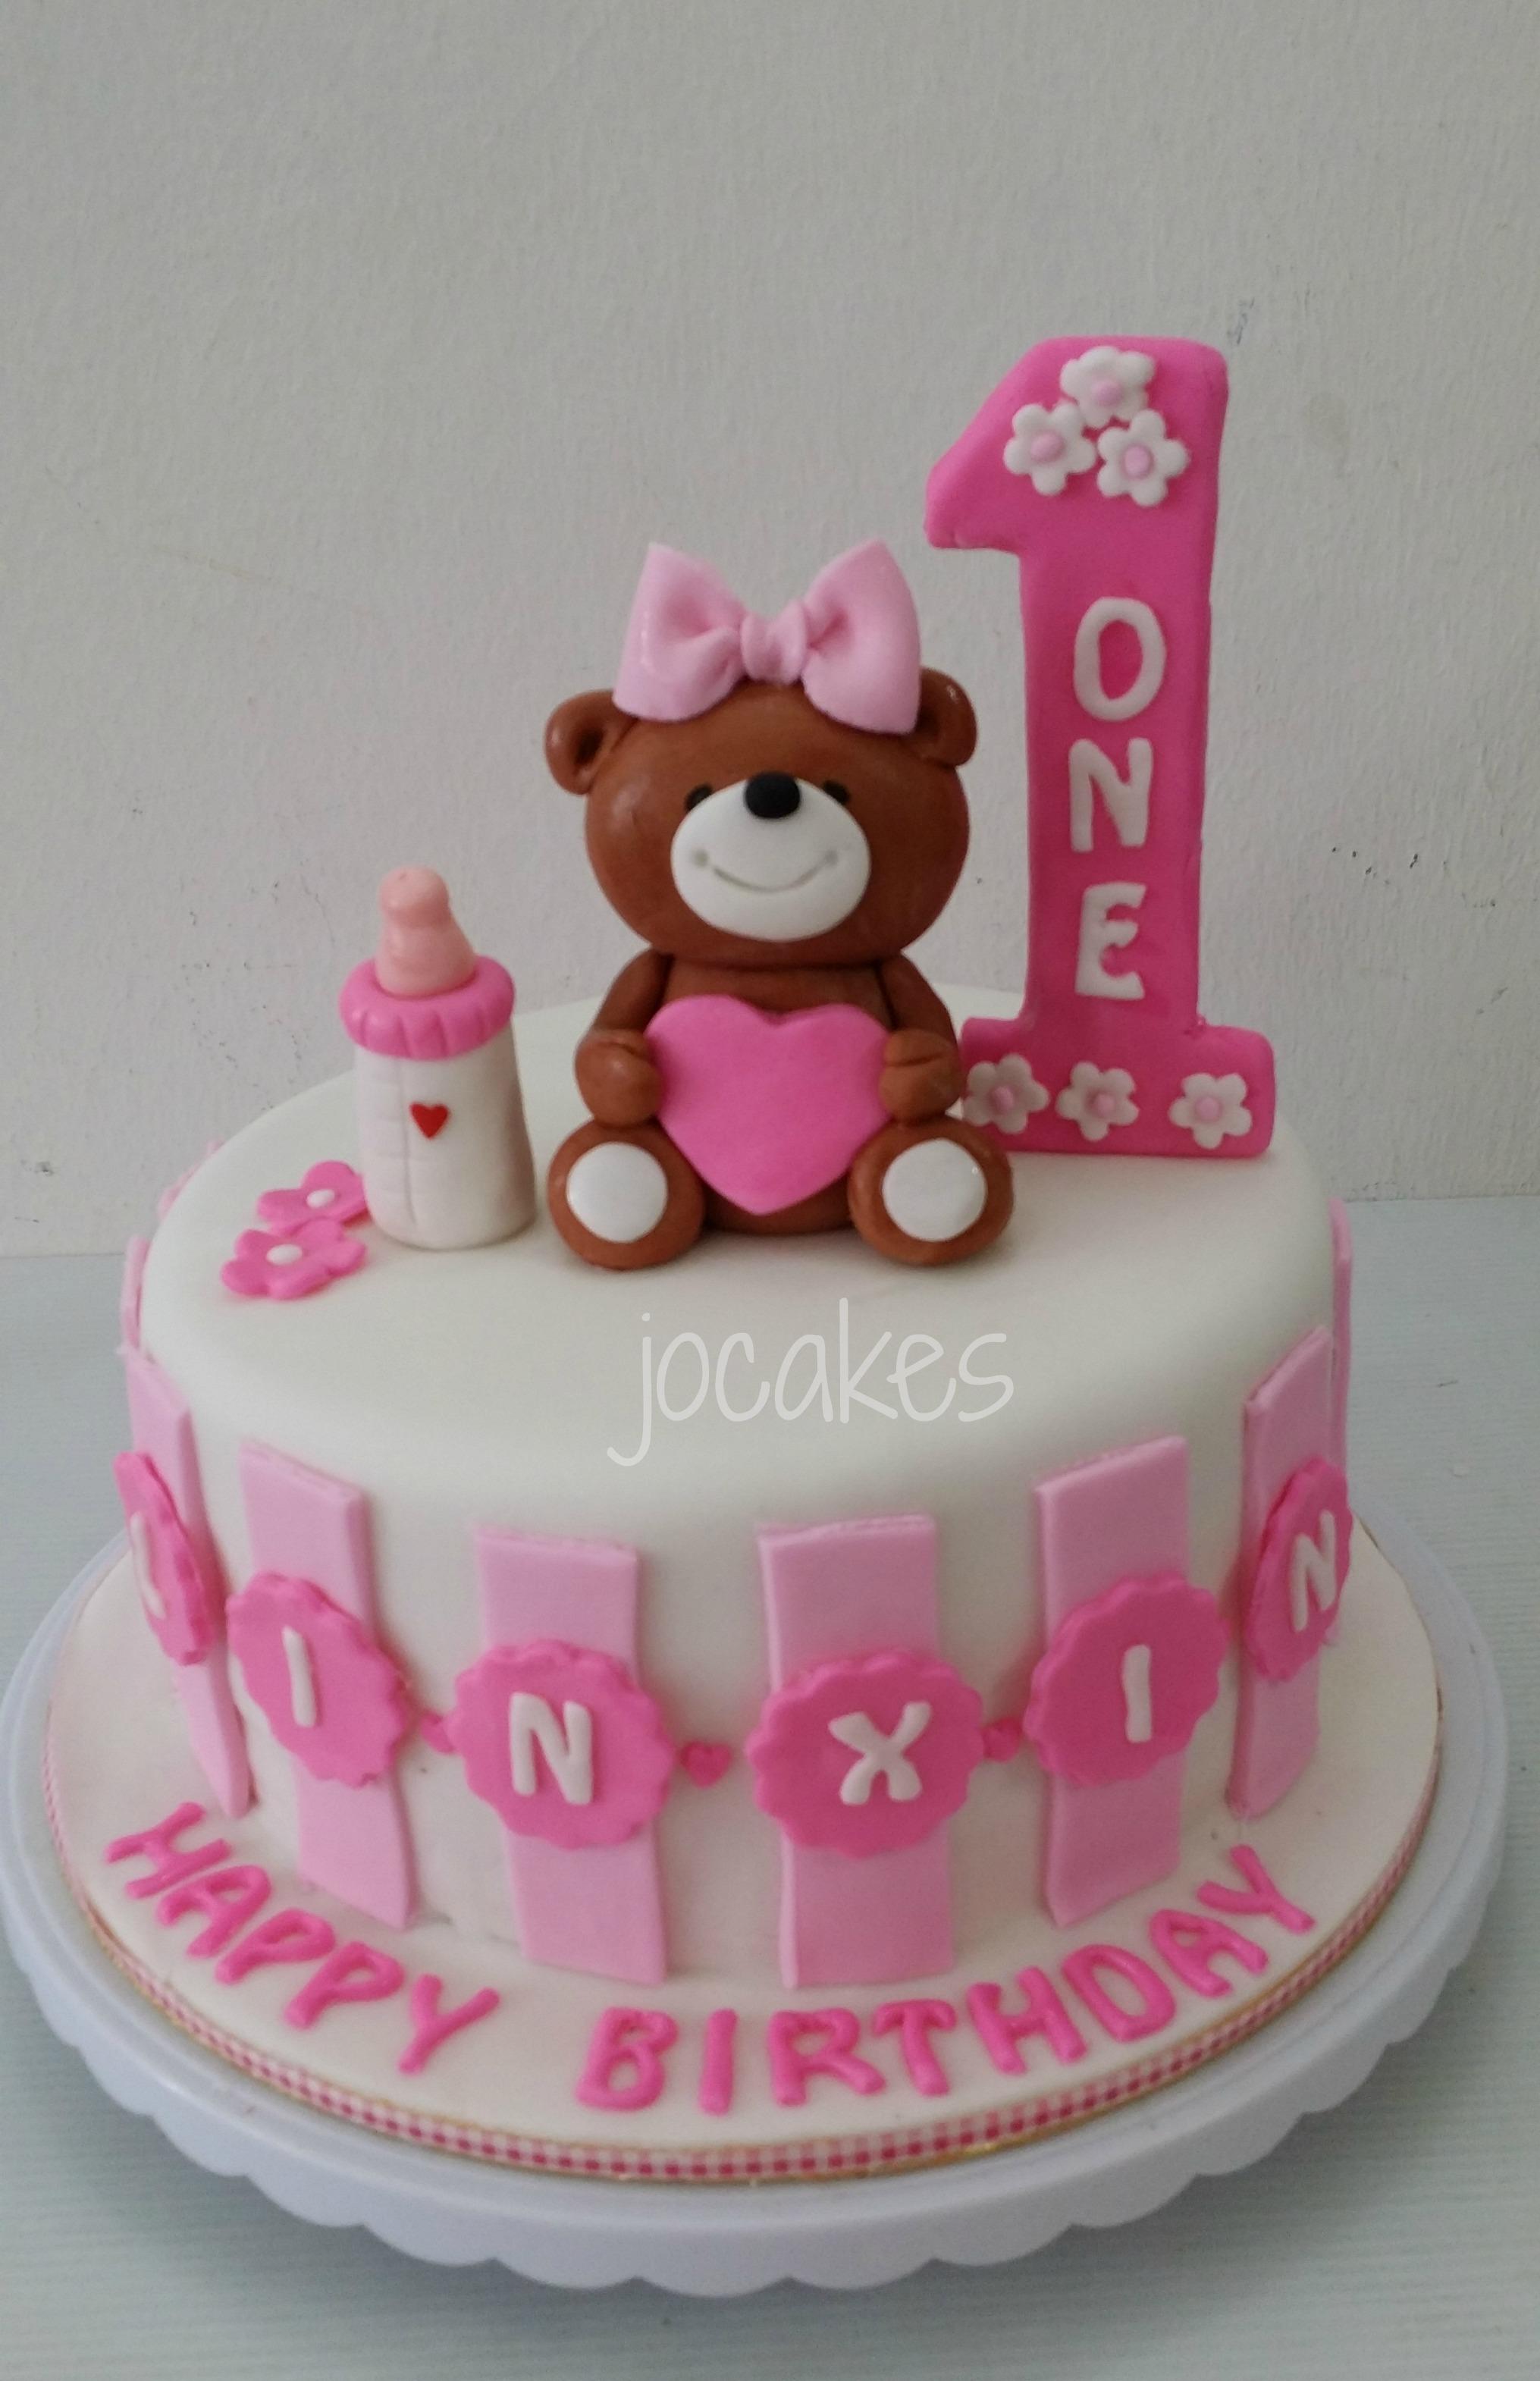 9 1 Year Baby Cakes Photo 1 Year Old Boy Birthday Cake Ideas 1